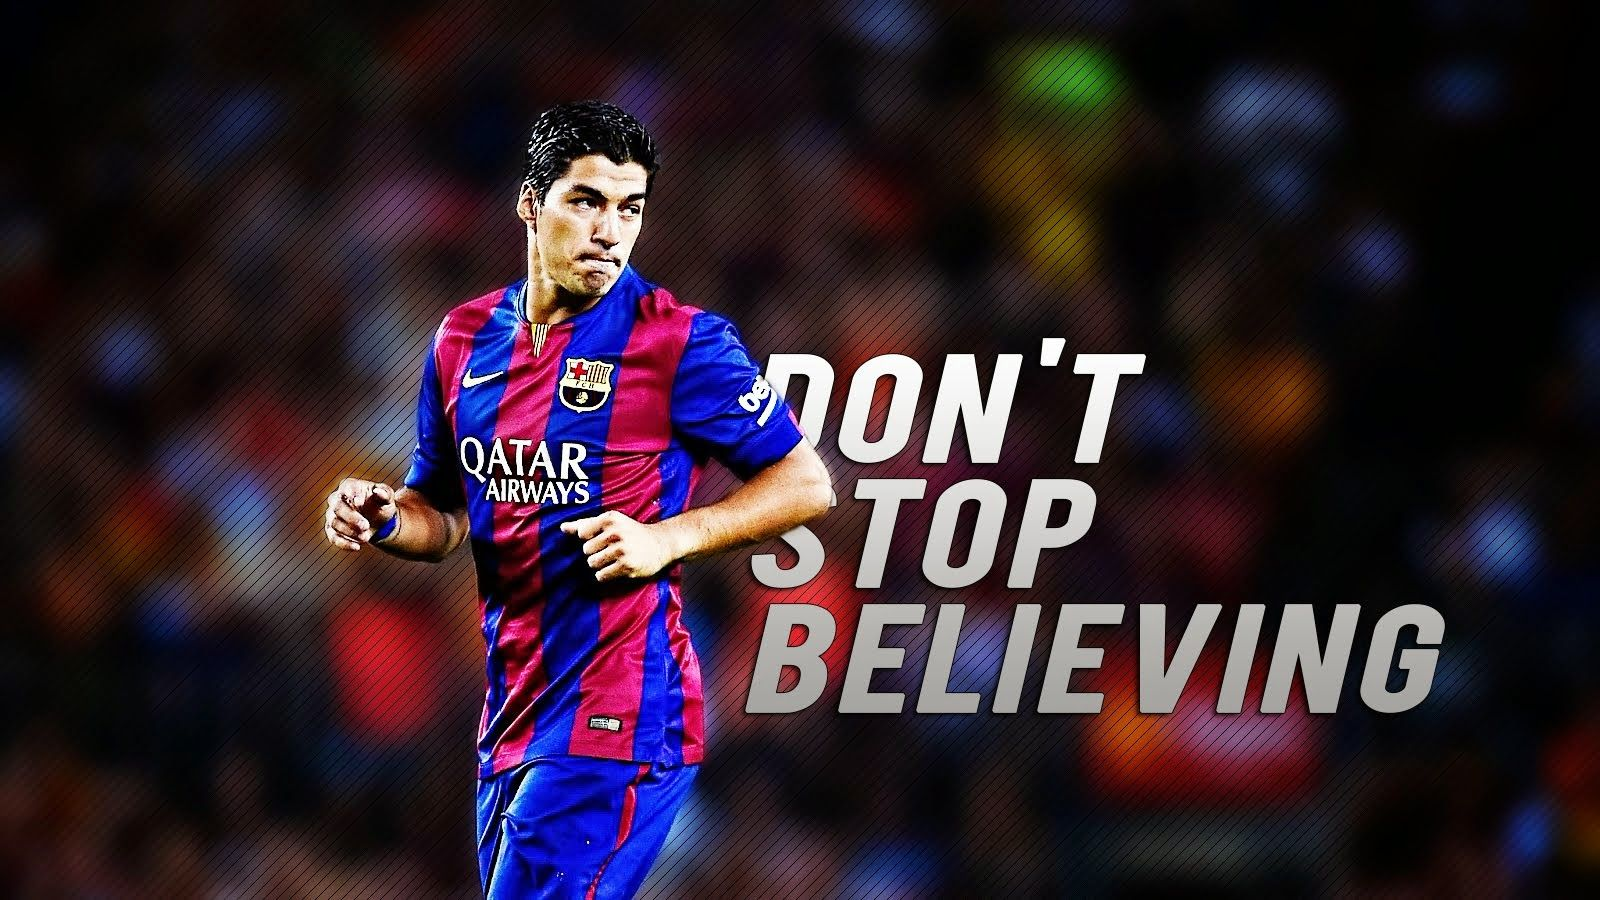 Luis Suarez Wallpapers 4k Ultra Hd Desktop Photos 46 Luis Suarez Suarez Best Football Players